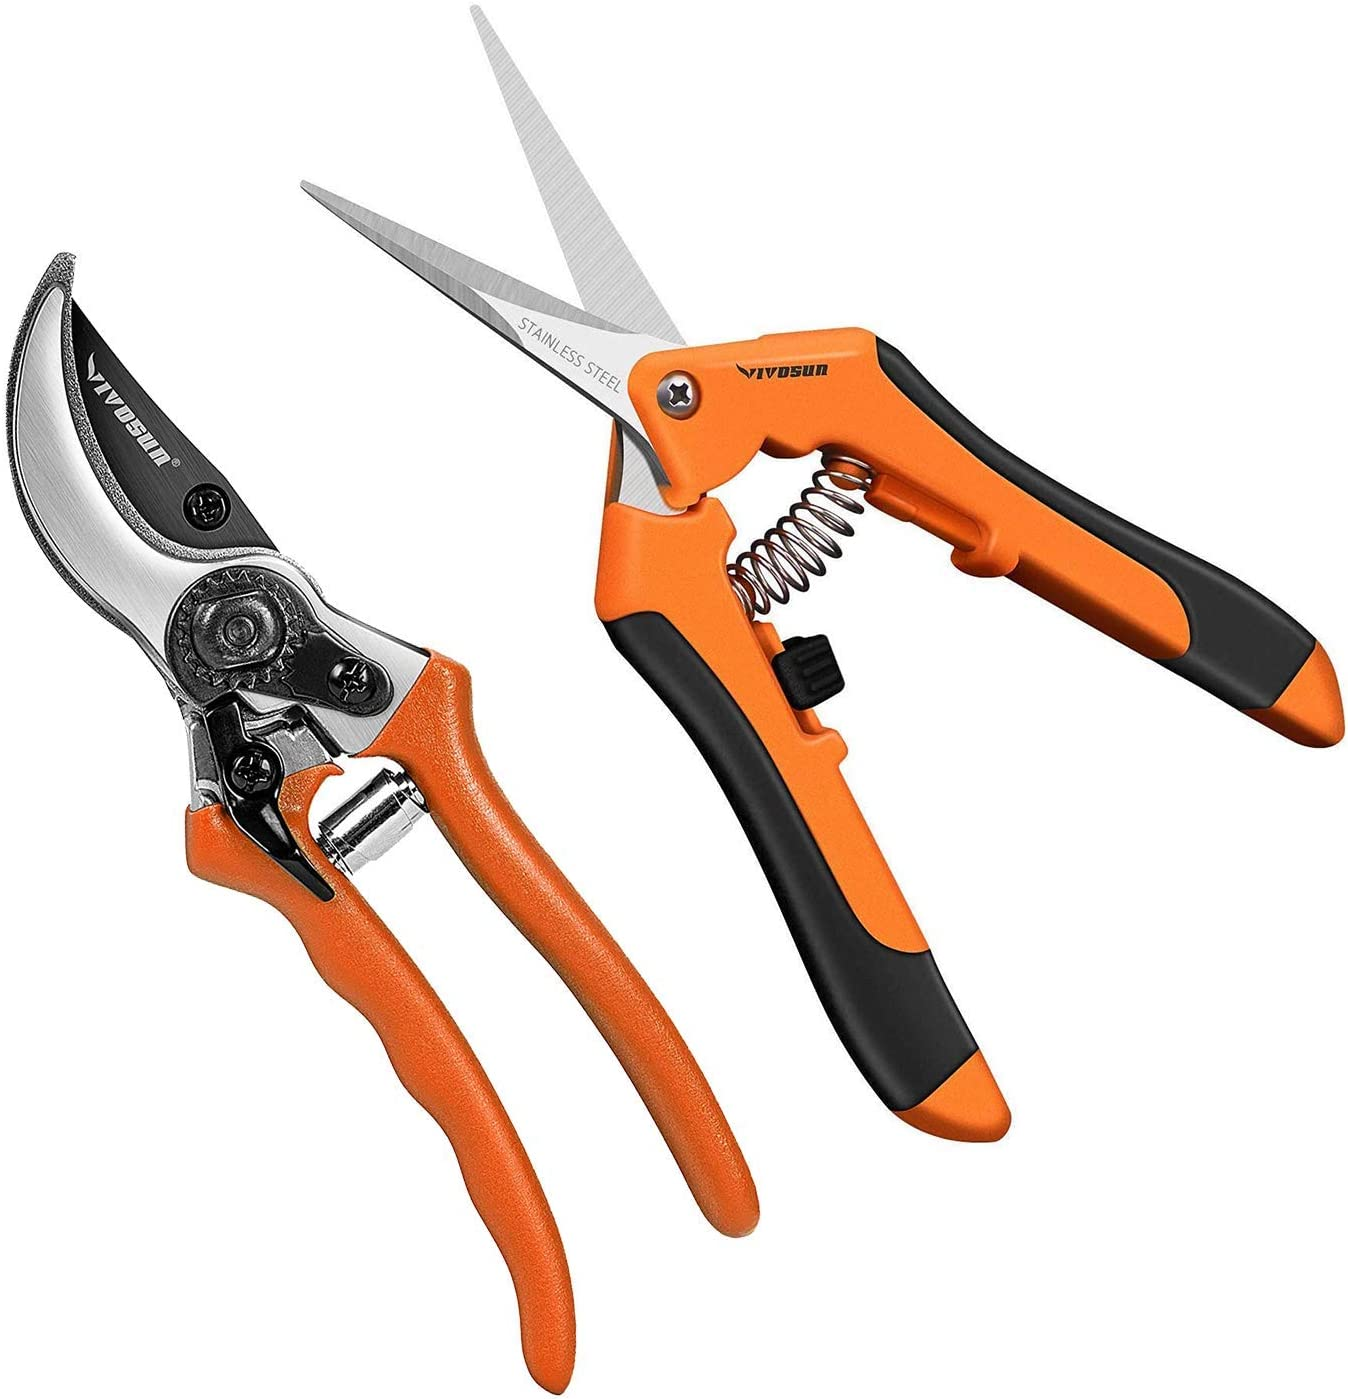 VIVOSUN Garden Hand Pruner Shear with Curved Blade and 8 Inch Bypass Pruning Shear, Orange